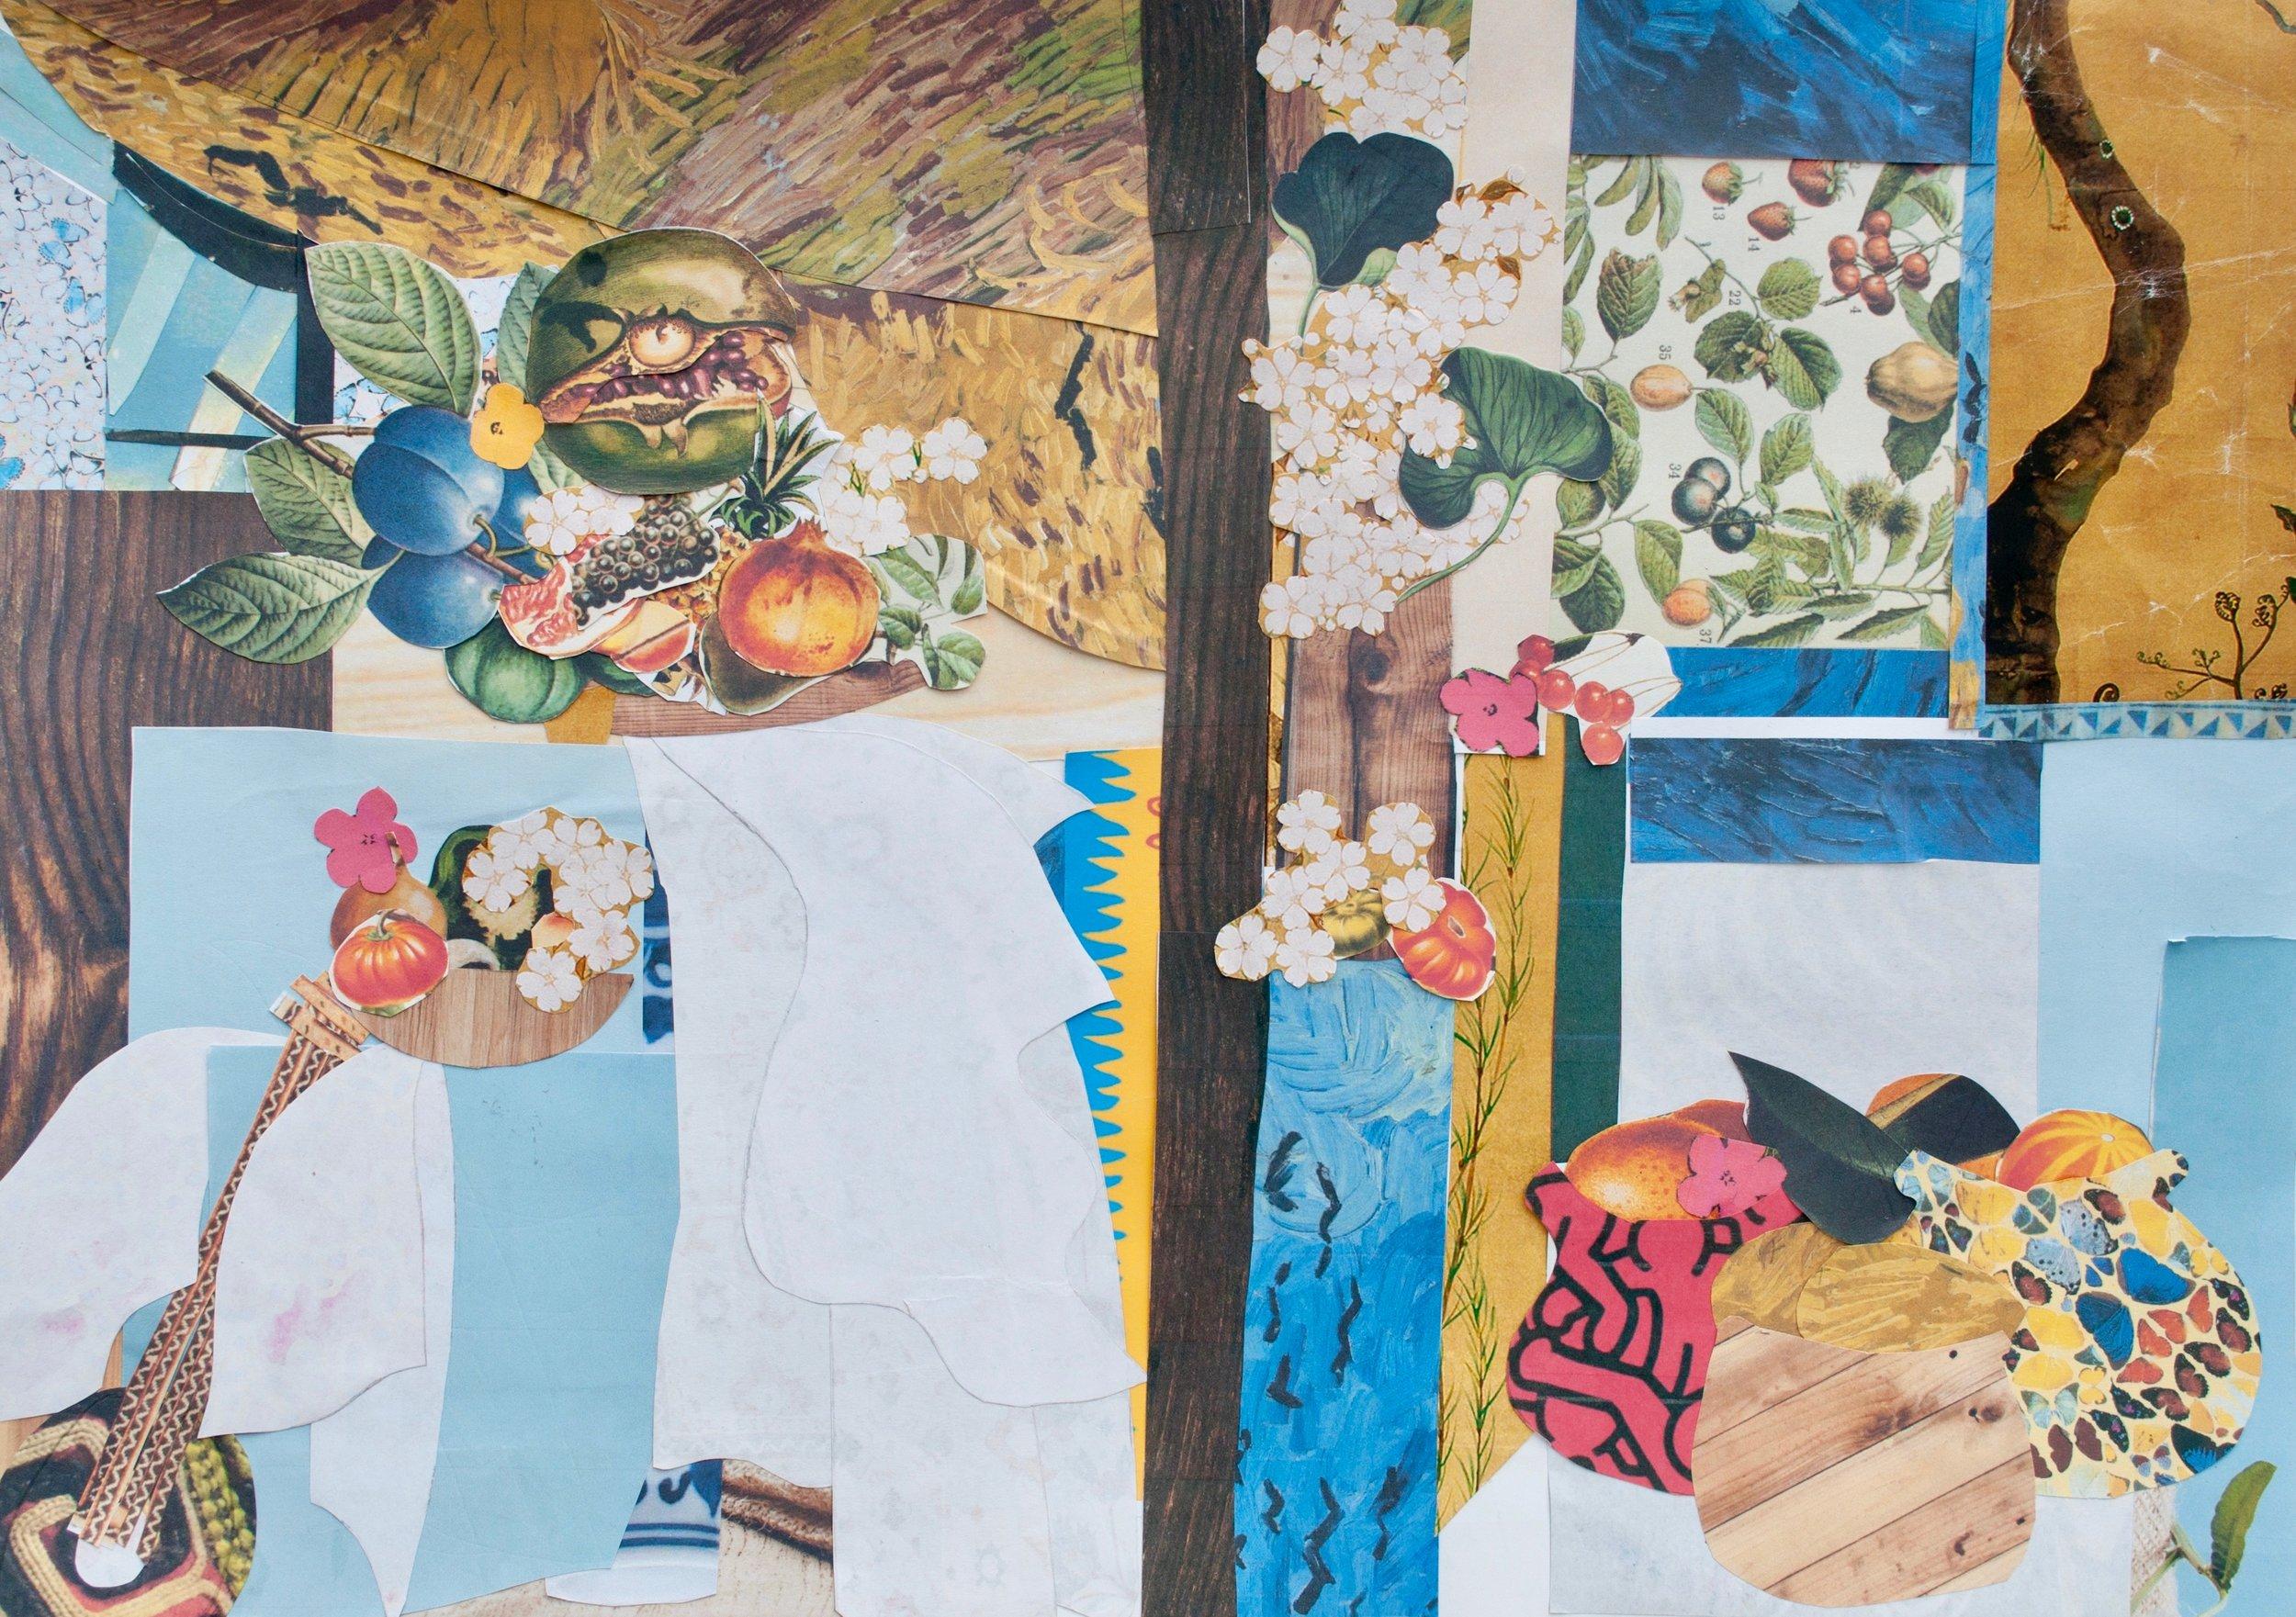 Nhan - Still Life after Henri Matisse's Still Life after Jan Davidsz de Heem's La Desserte.jpg